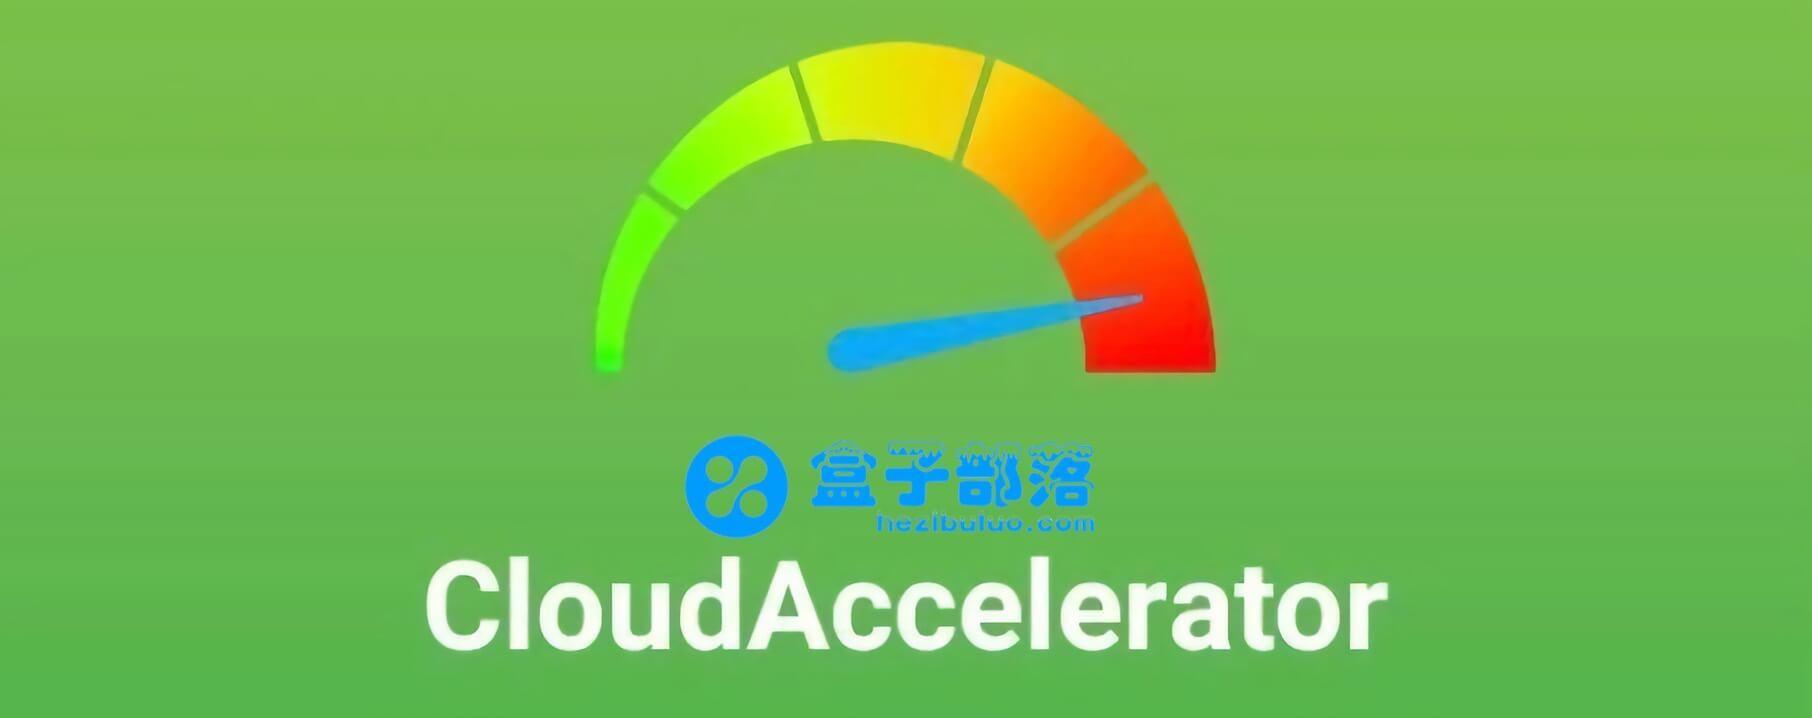 CloudAccelerator v1.5.3 黑科技加成的第三方百度网盘不限速下载器